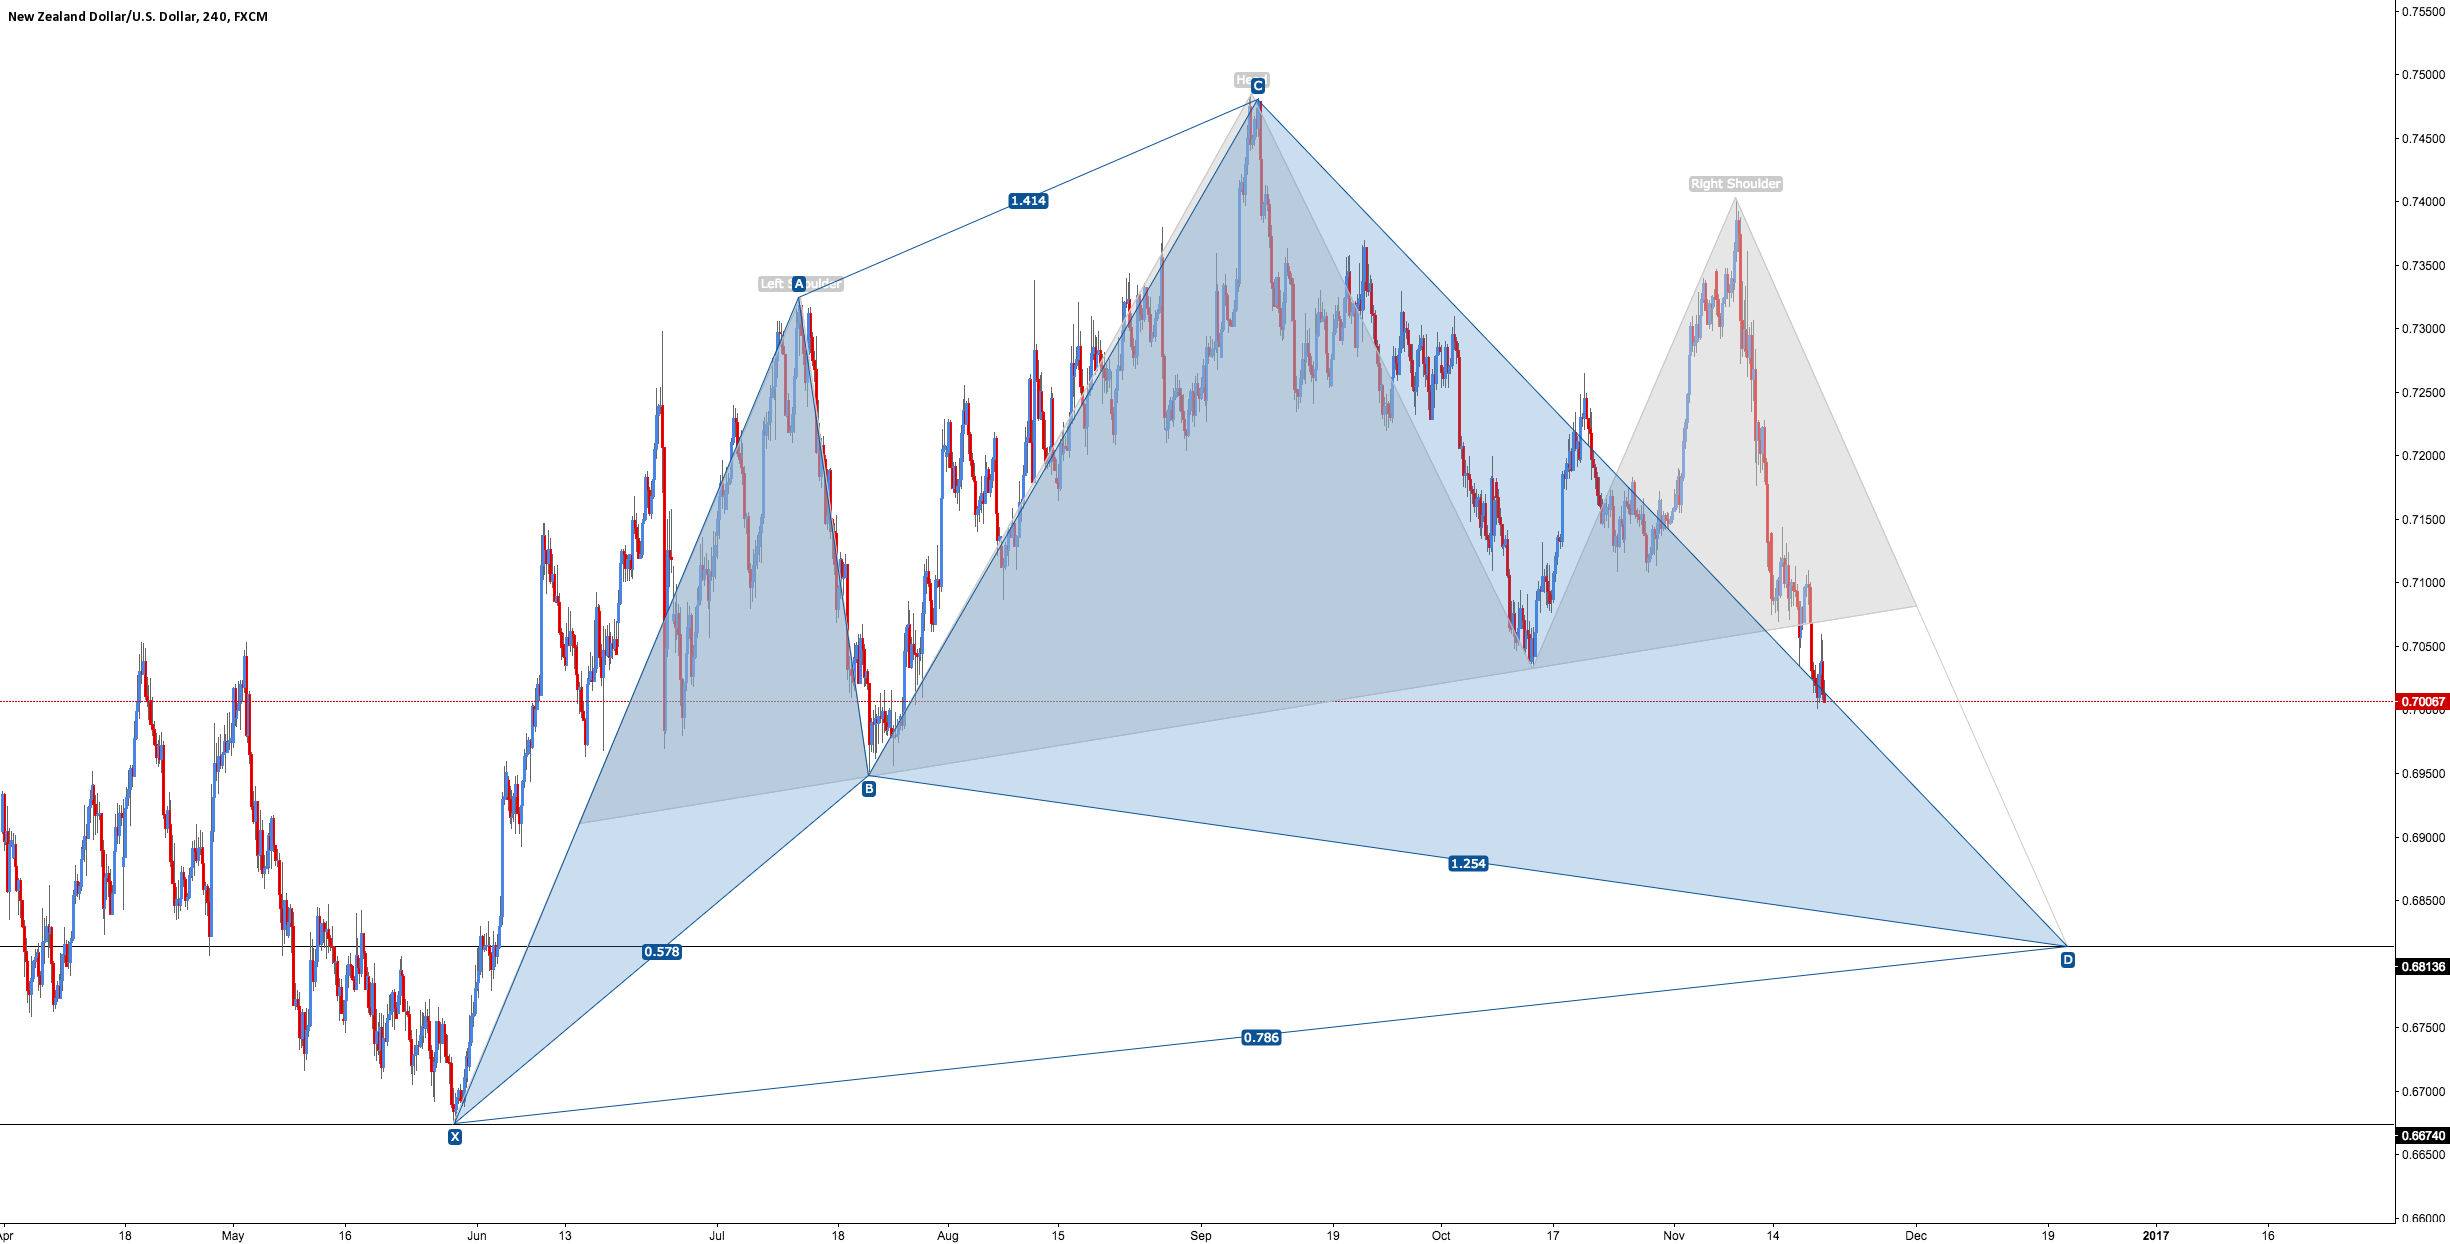 NZD/USD - Bullish Cypher (Confluence)